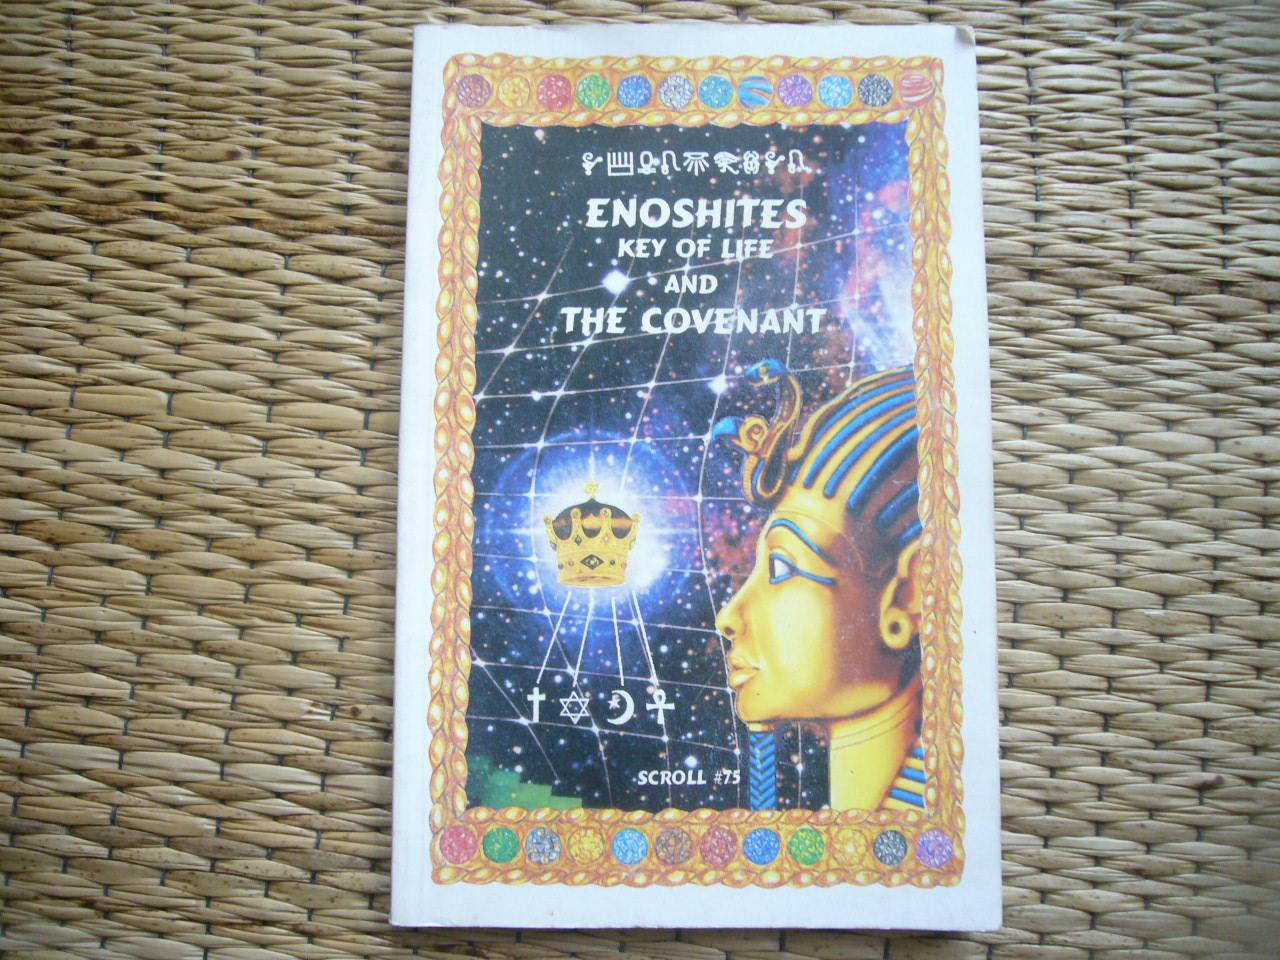 Enoshites: Key of Life And the Covenant